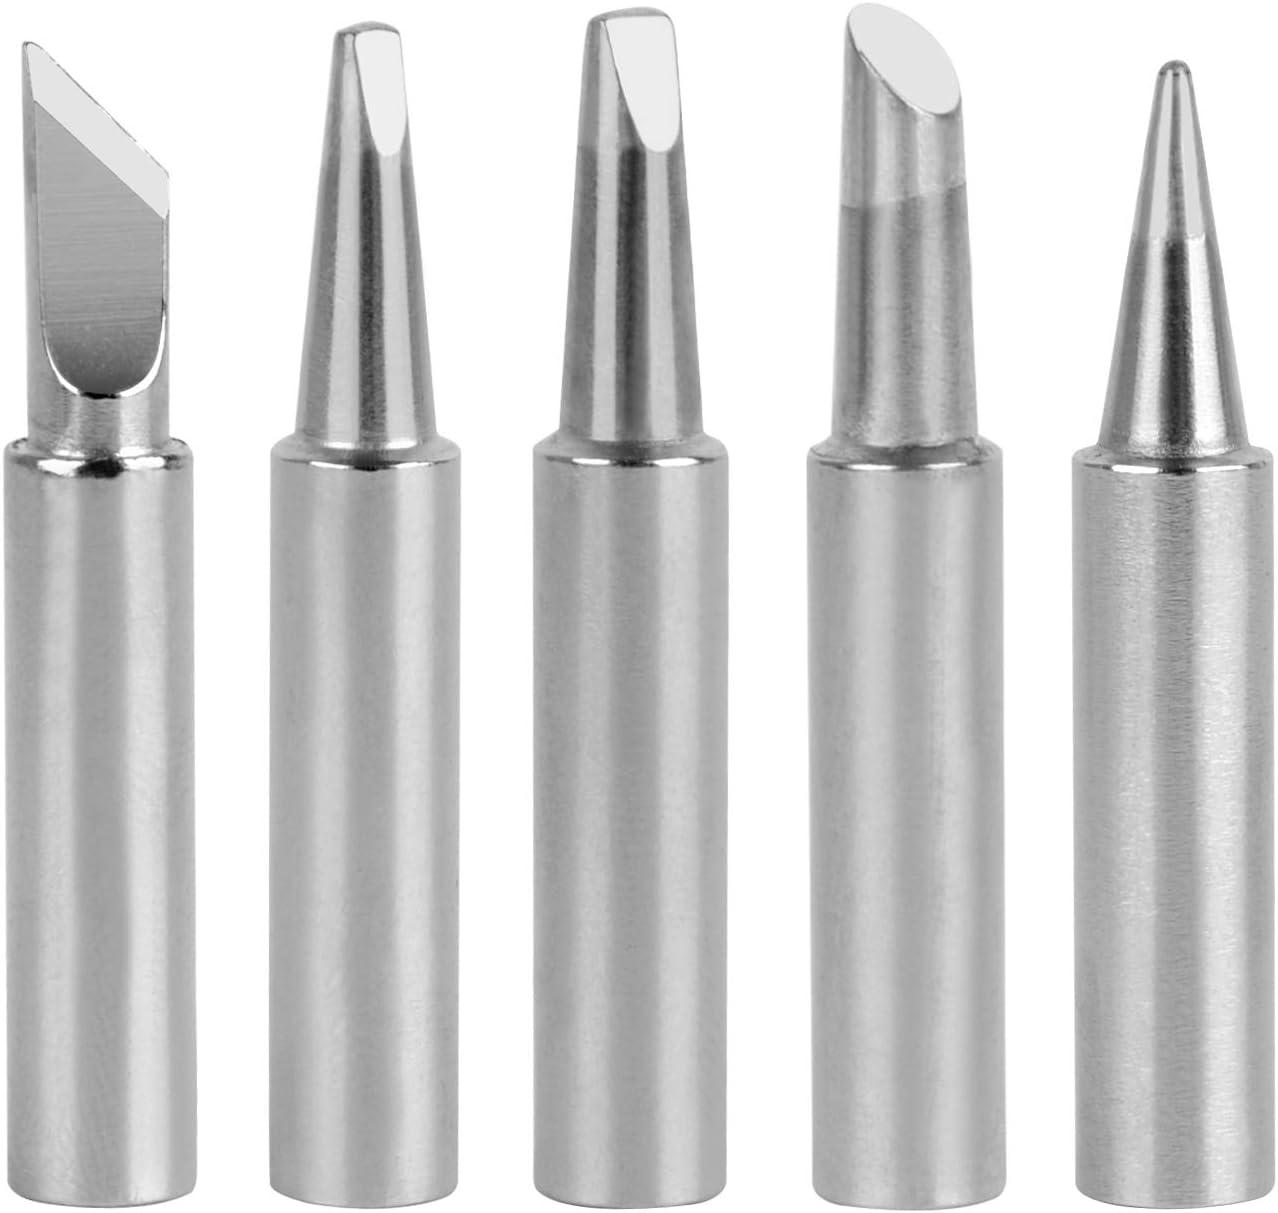 T18 Soldering Tips For HAKKO FX-888D FX-8801 FX-600 T18-D12